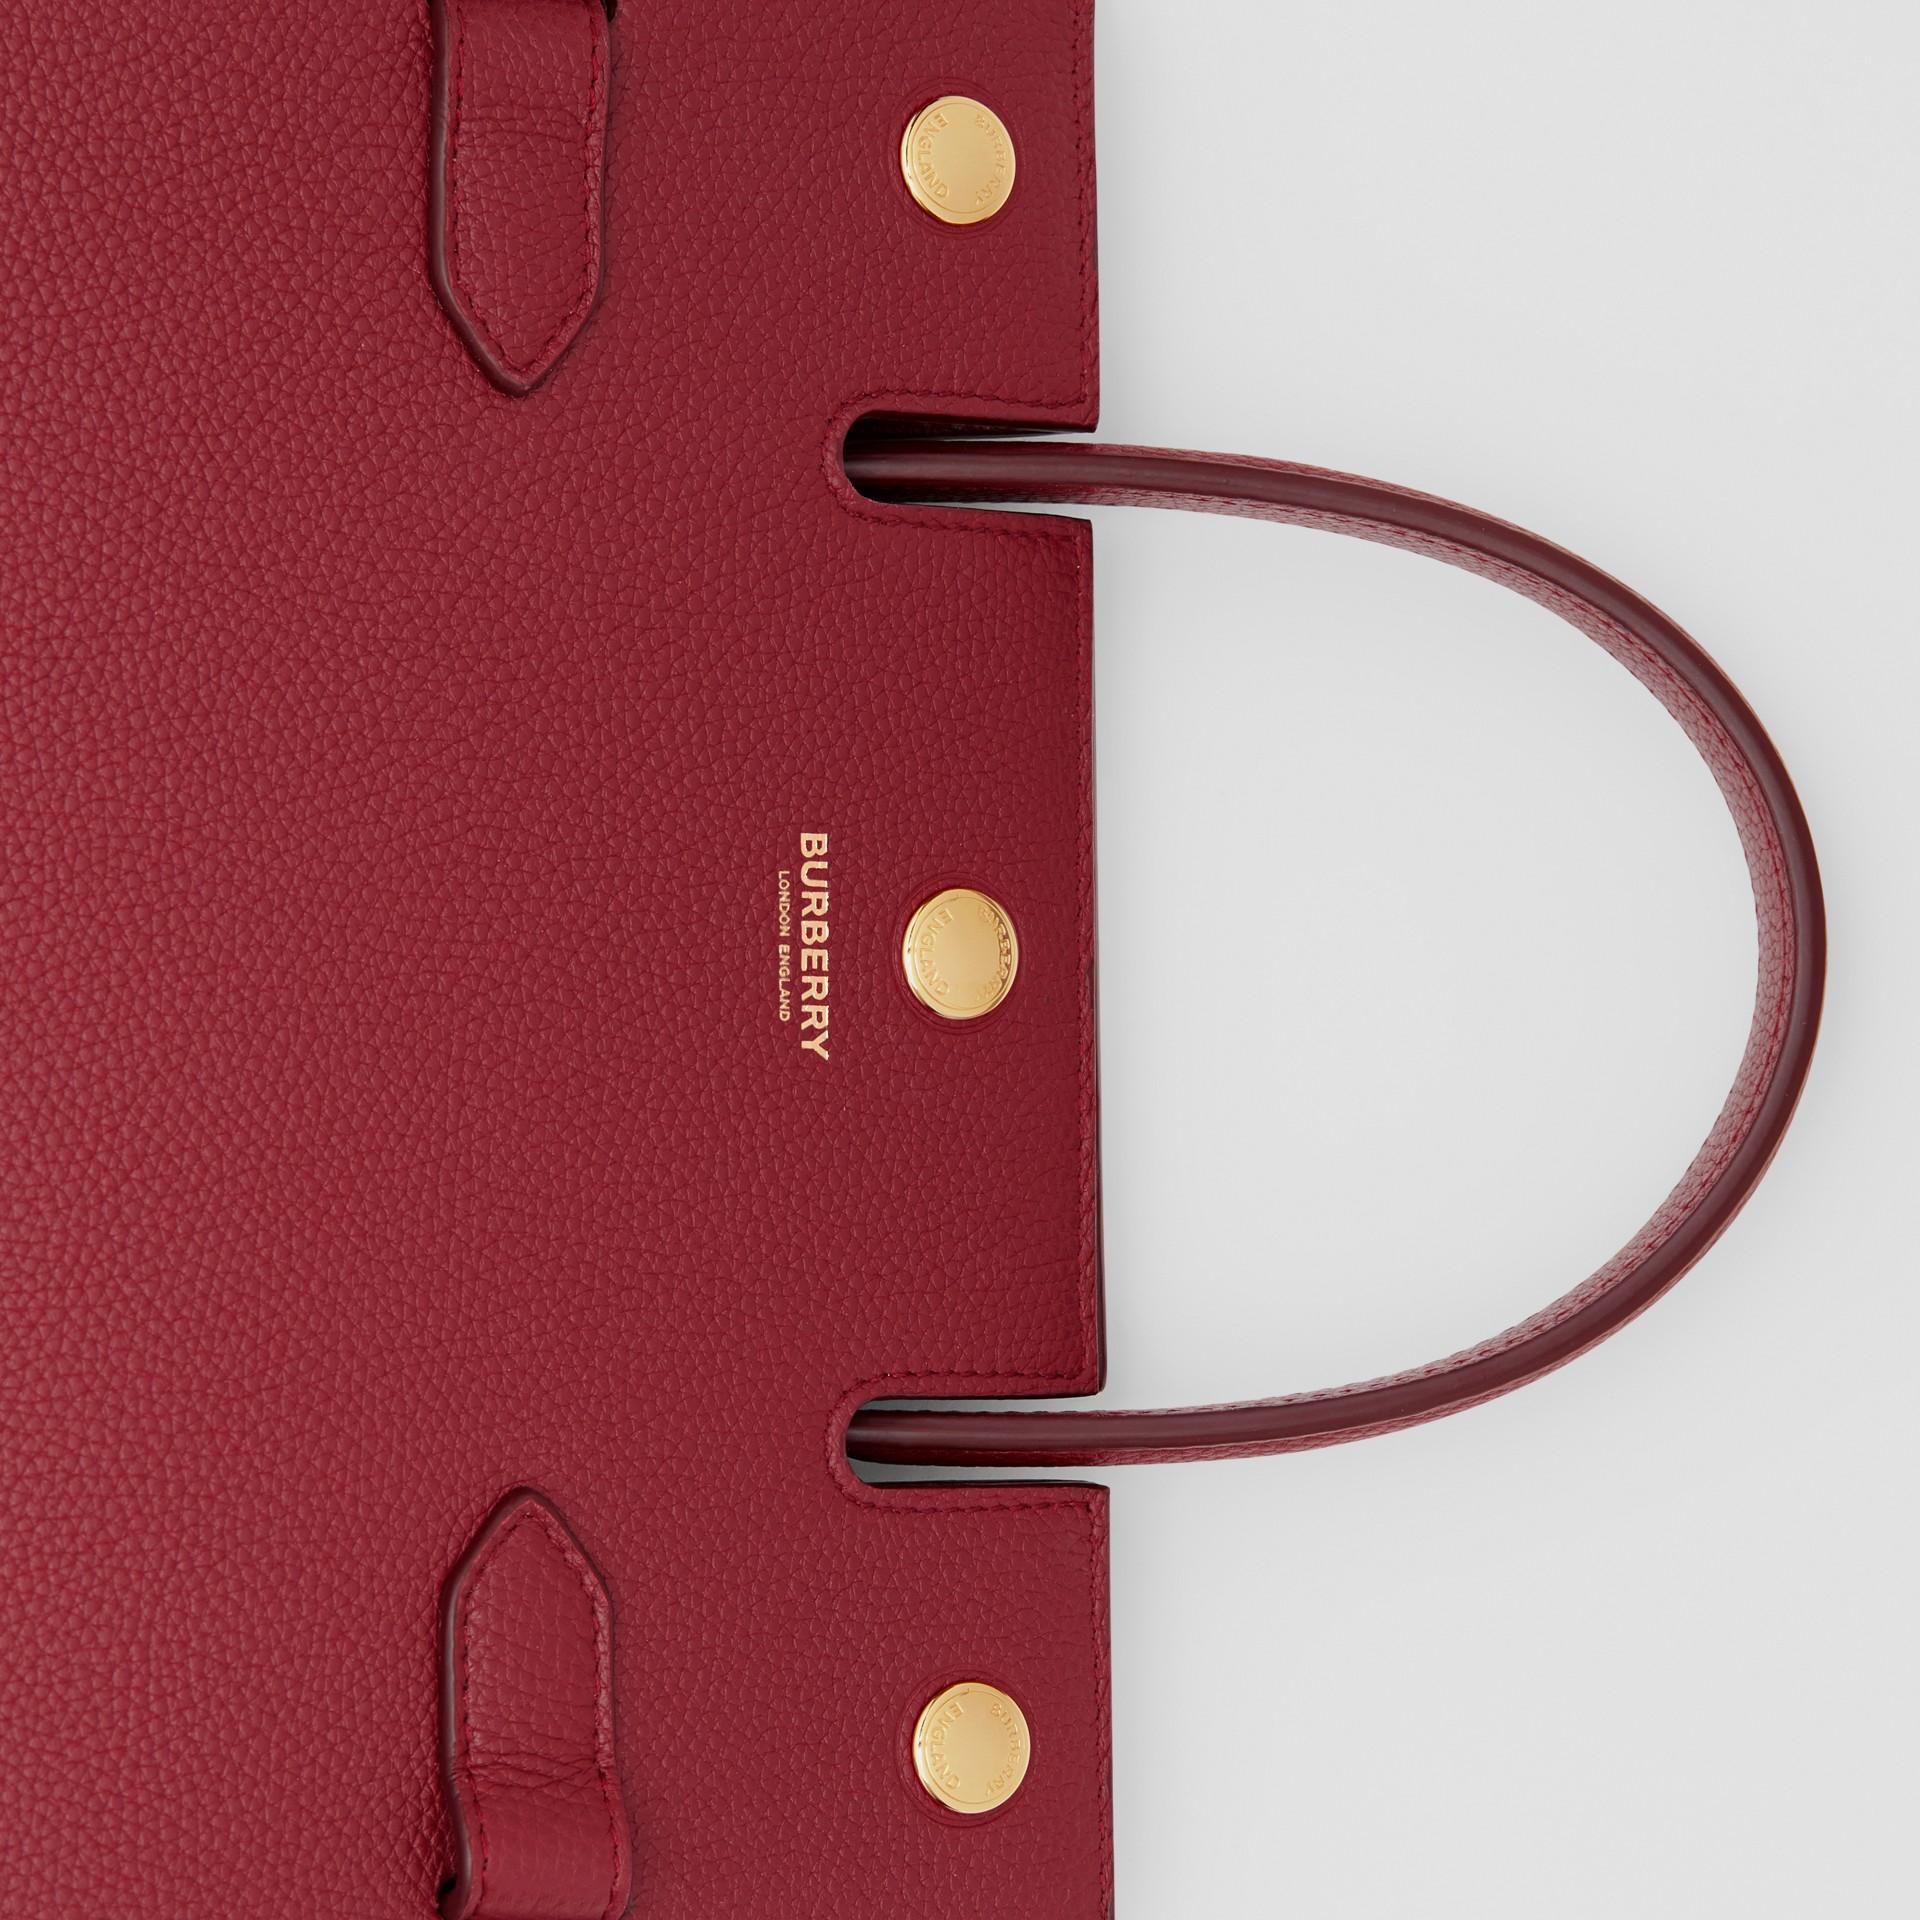 Mini Leather Title Bag in Dark Crimson - Women | Burberry United Kingdom - gallery image 1